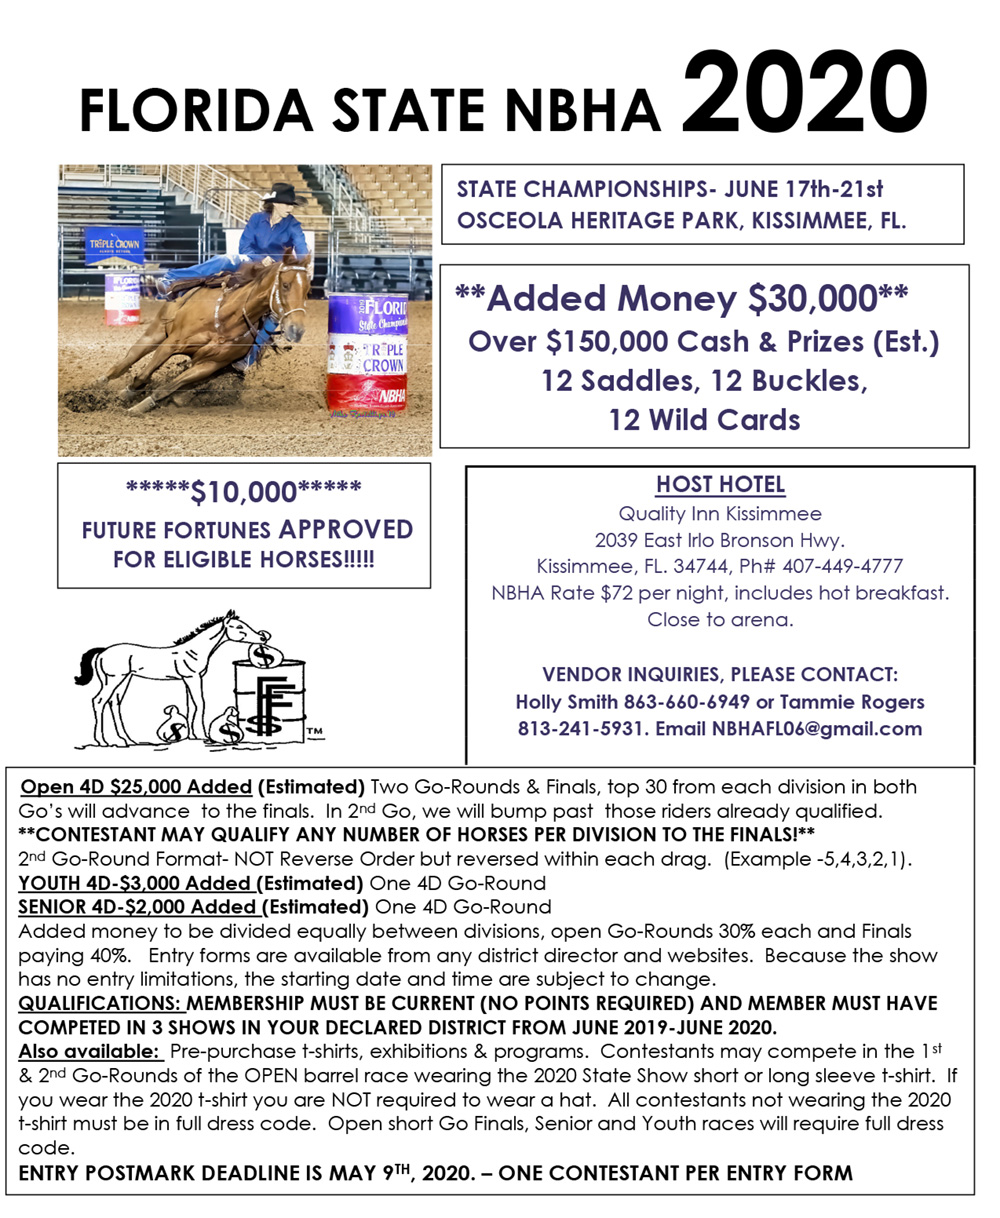 2020 Florida State Show